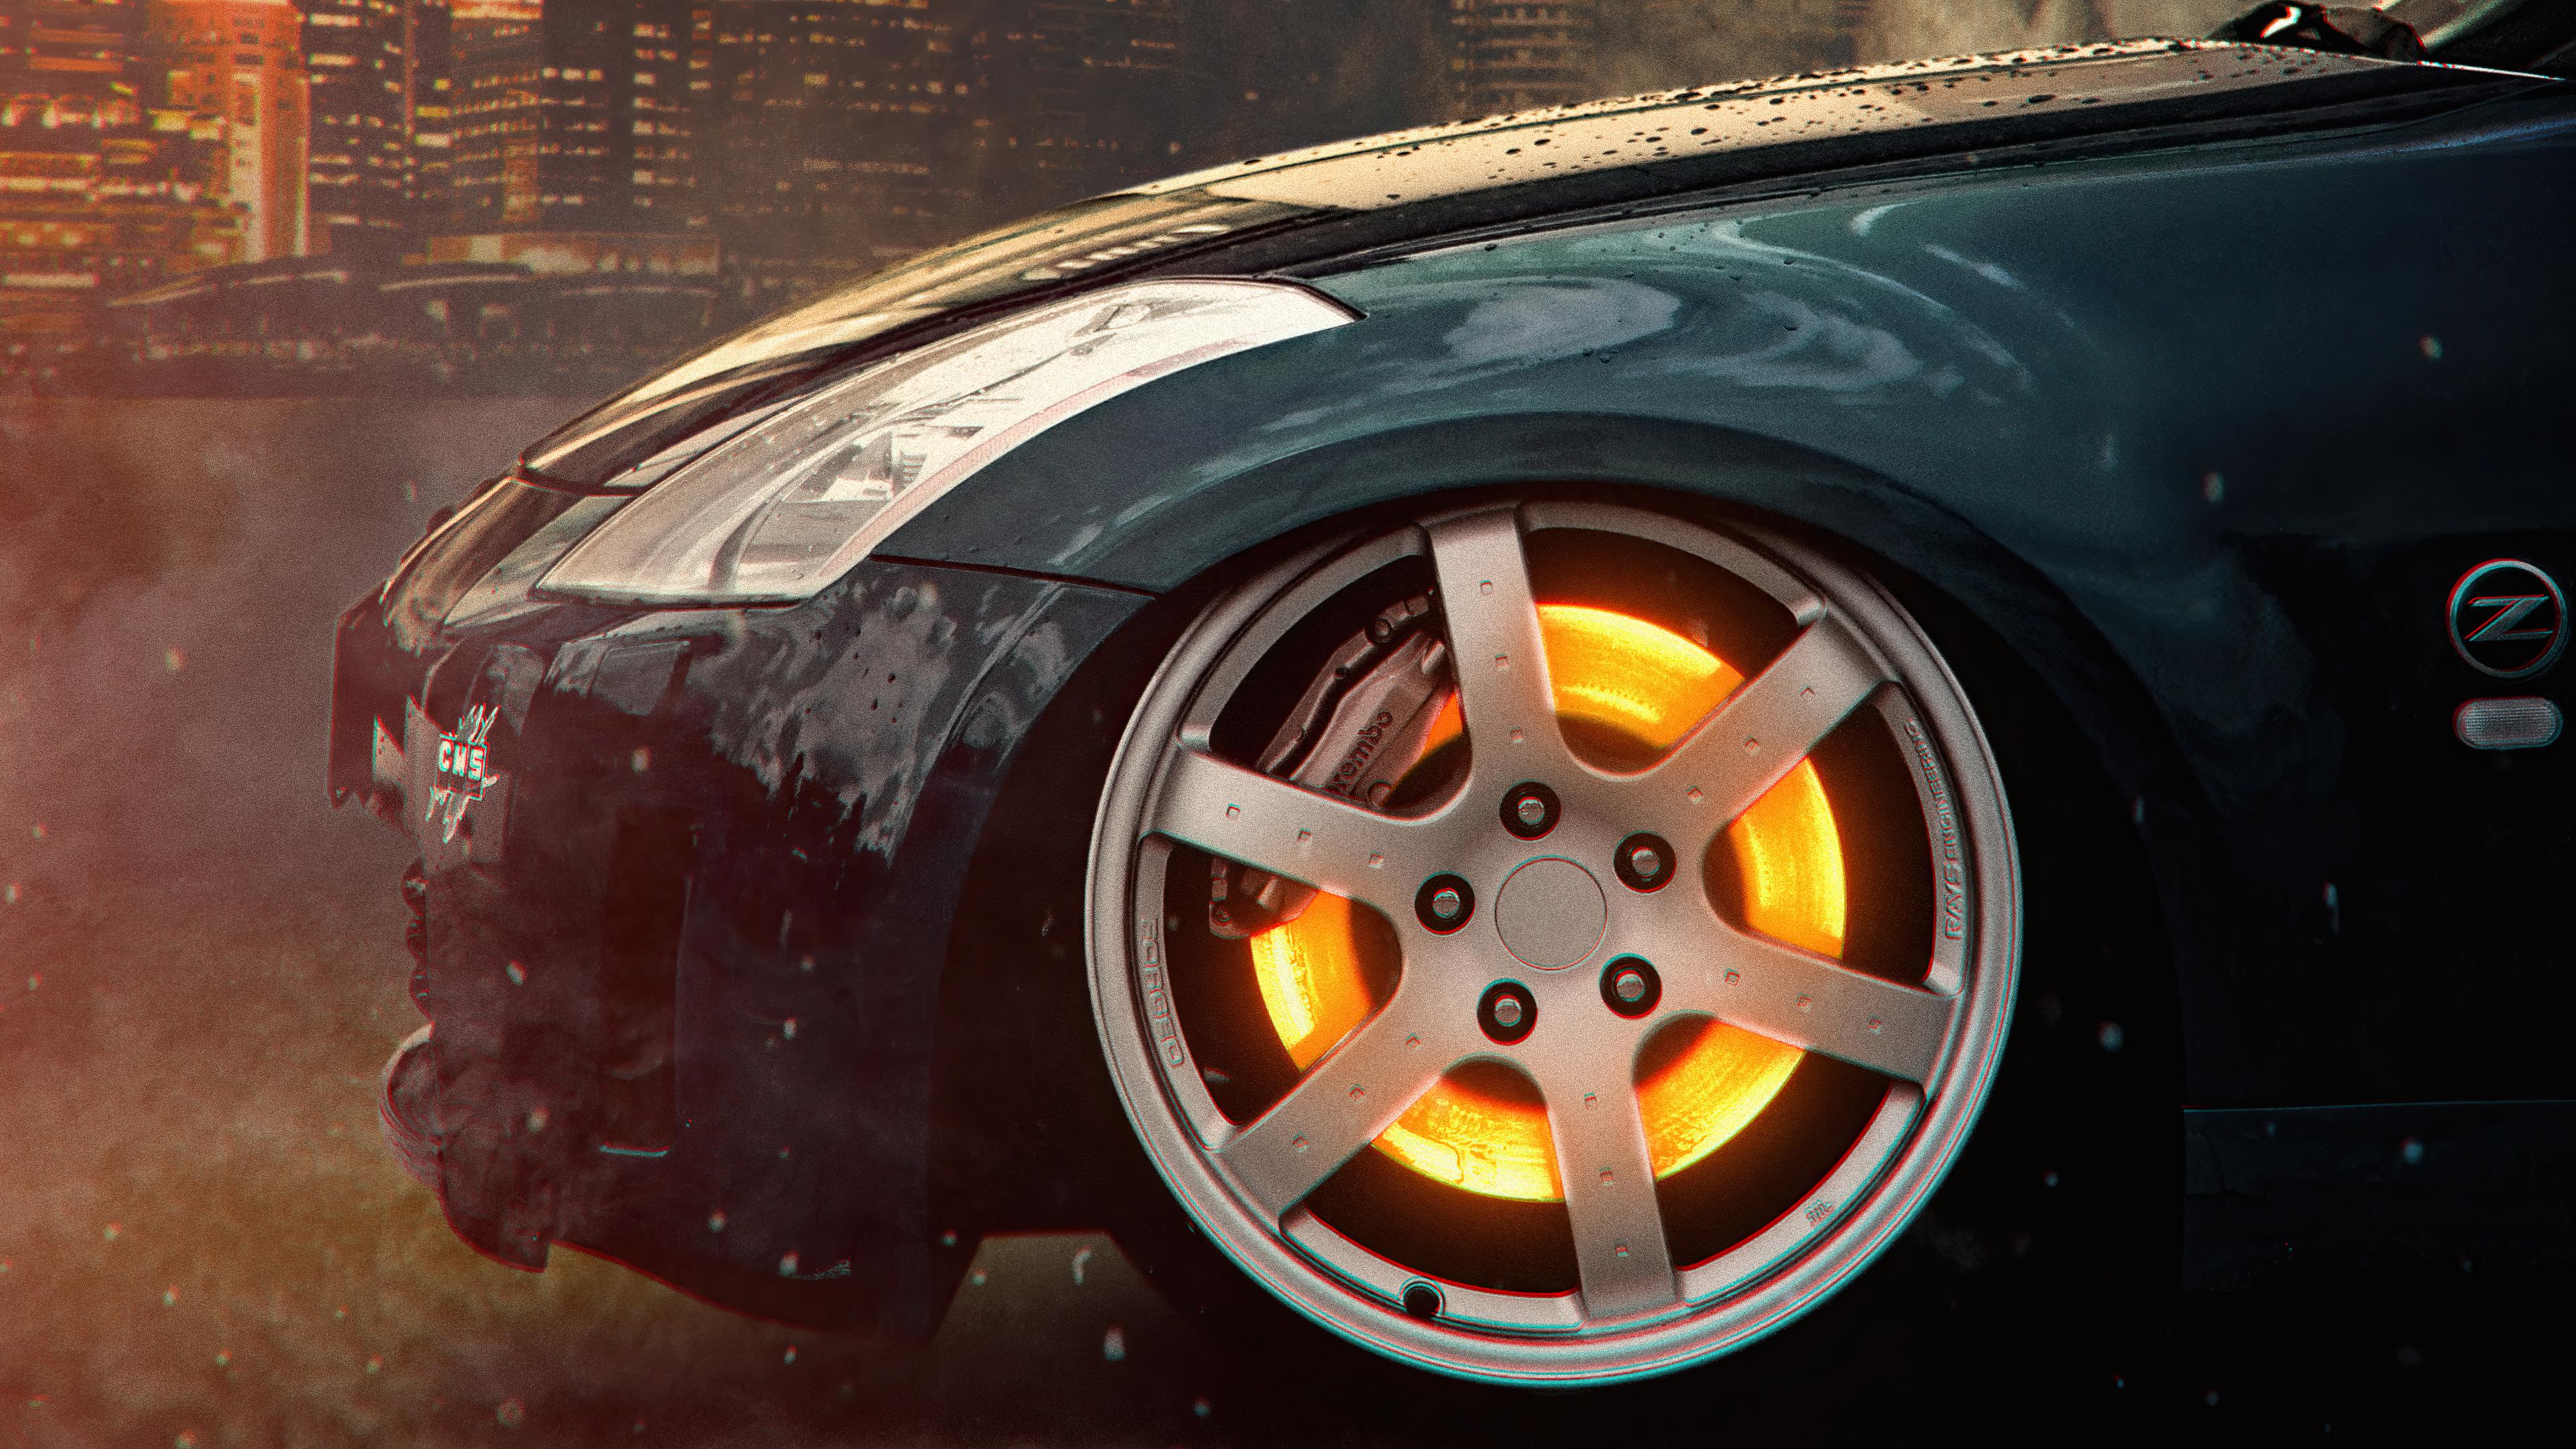 car glowing wheel disc 4k 1618920194 - Car Glowing Wheel Disc 4k - Car Glowing Wheel Disc 4k wallpapers